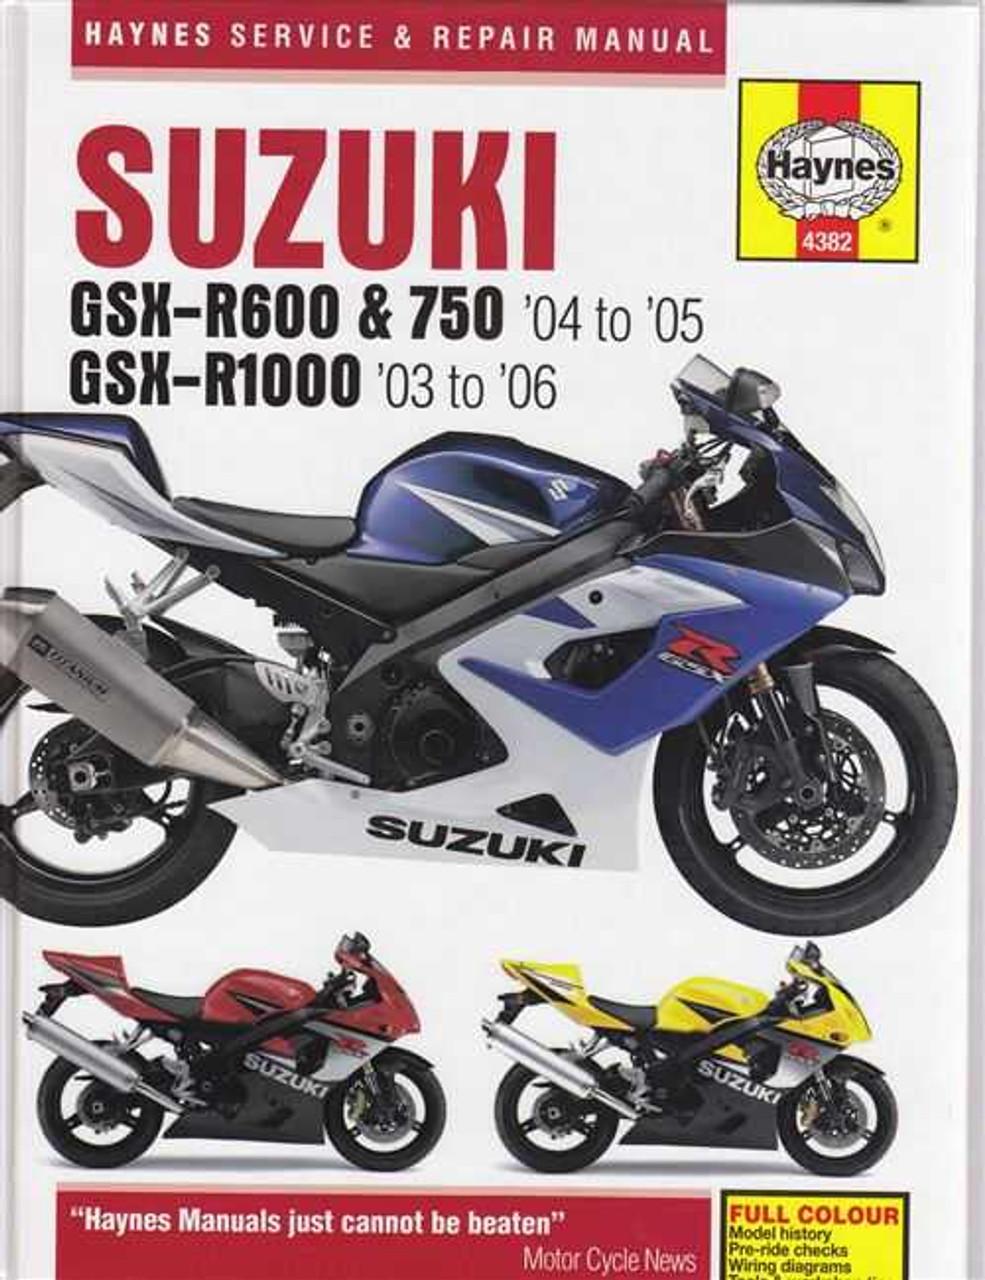 Suzuki GSX-R600, GSX-R750, GSX-R1000 2003 - 2006 Workshop Manual